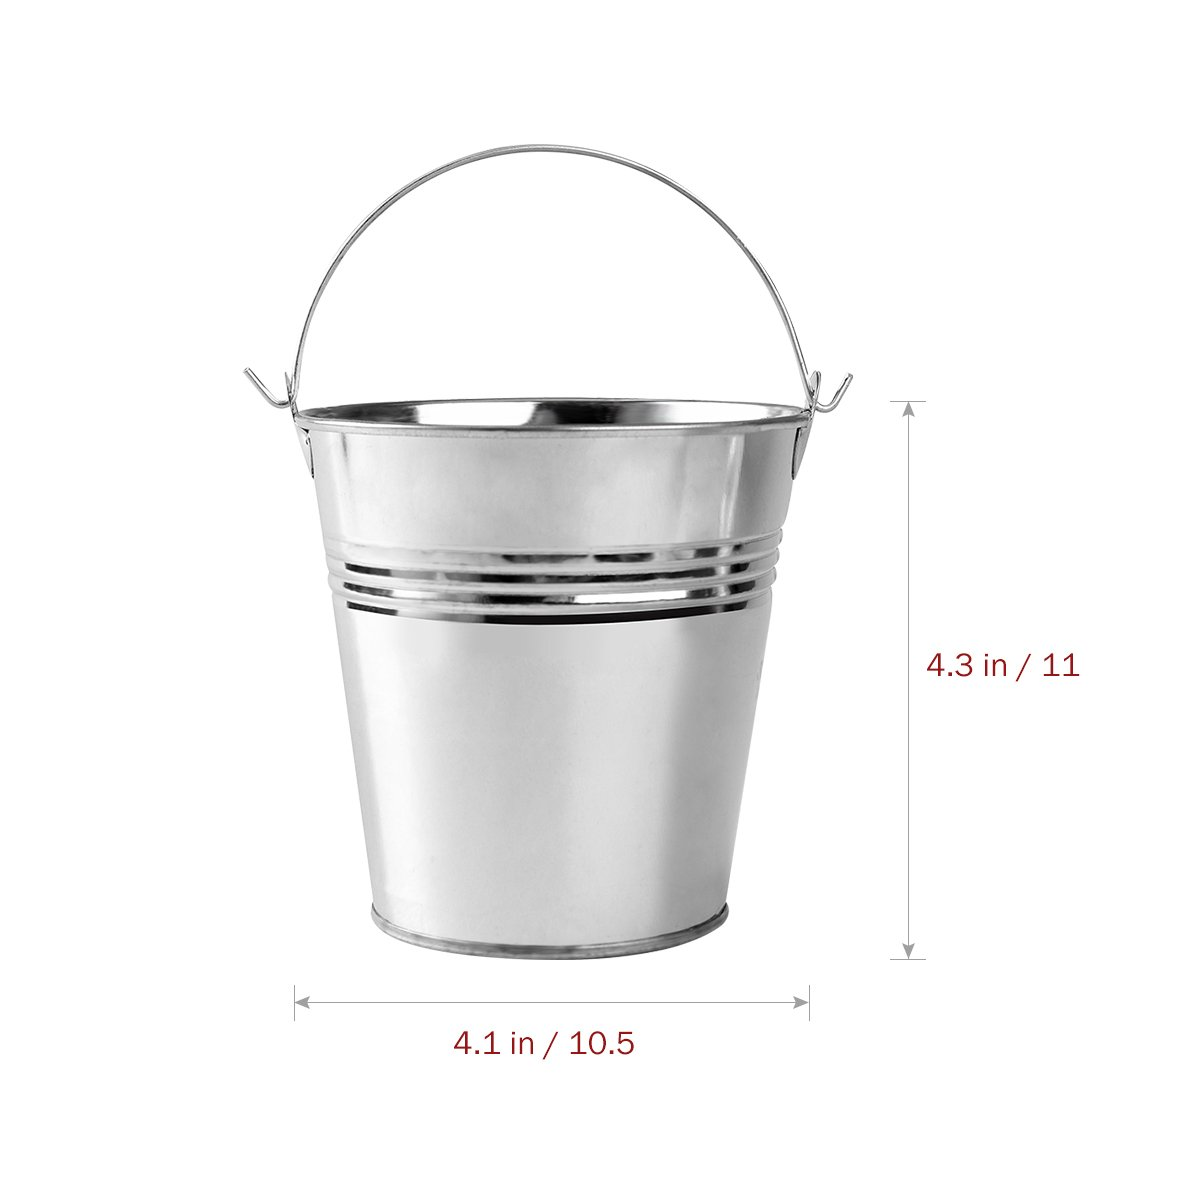 OUNONA Mini Metal Bucket Set of 6 /Mini Food Containers/Succulent Wedding Buckets 10.5x7.2x10.5cm by OUNONA (Image #5)